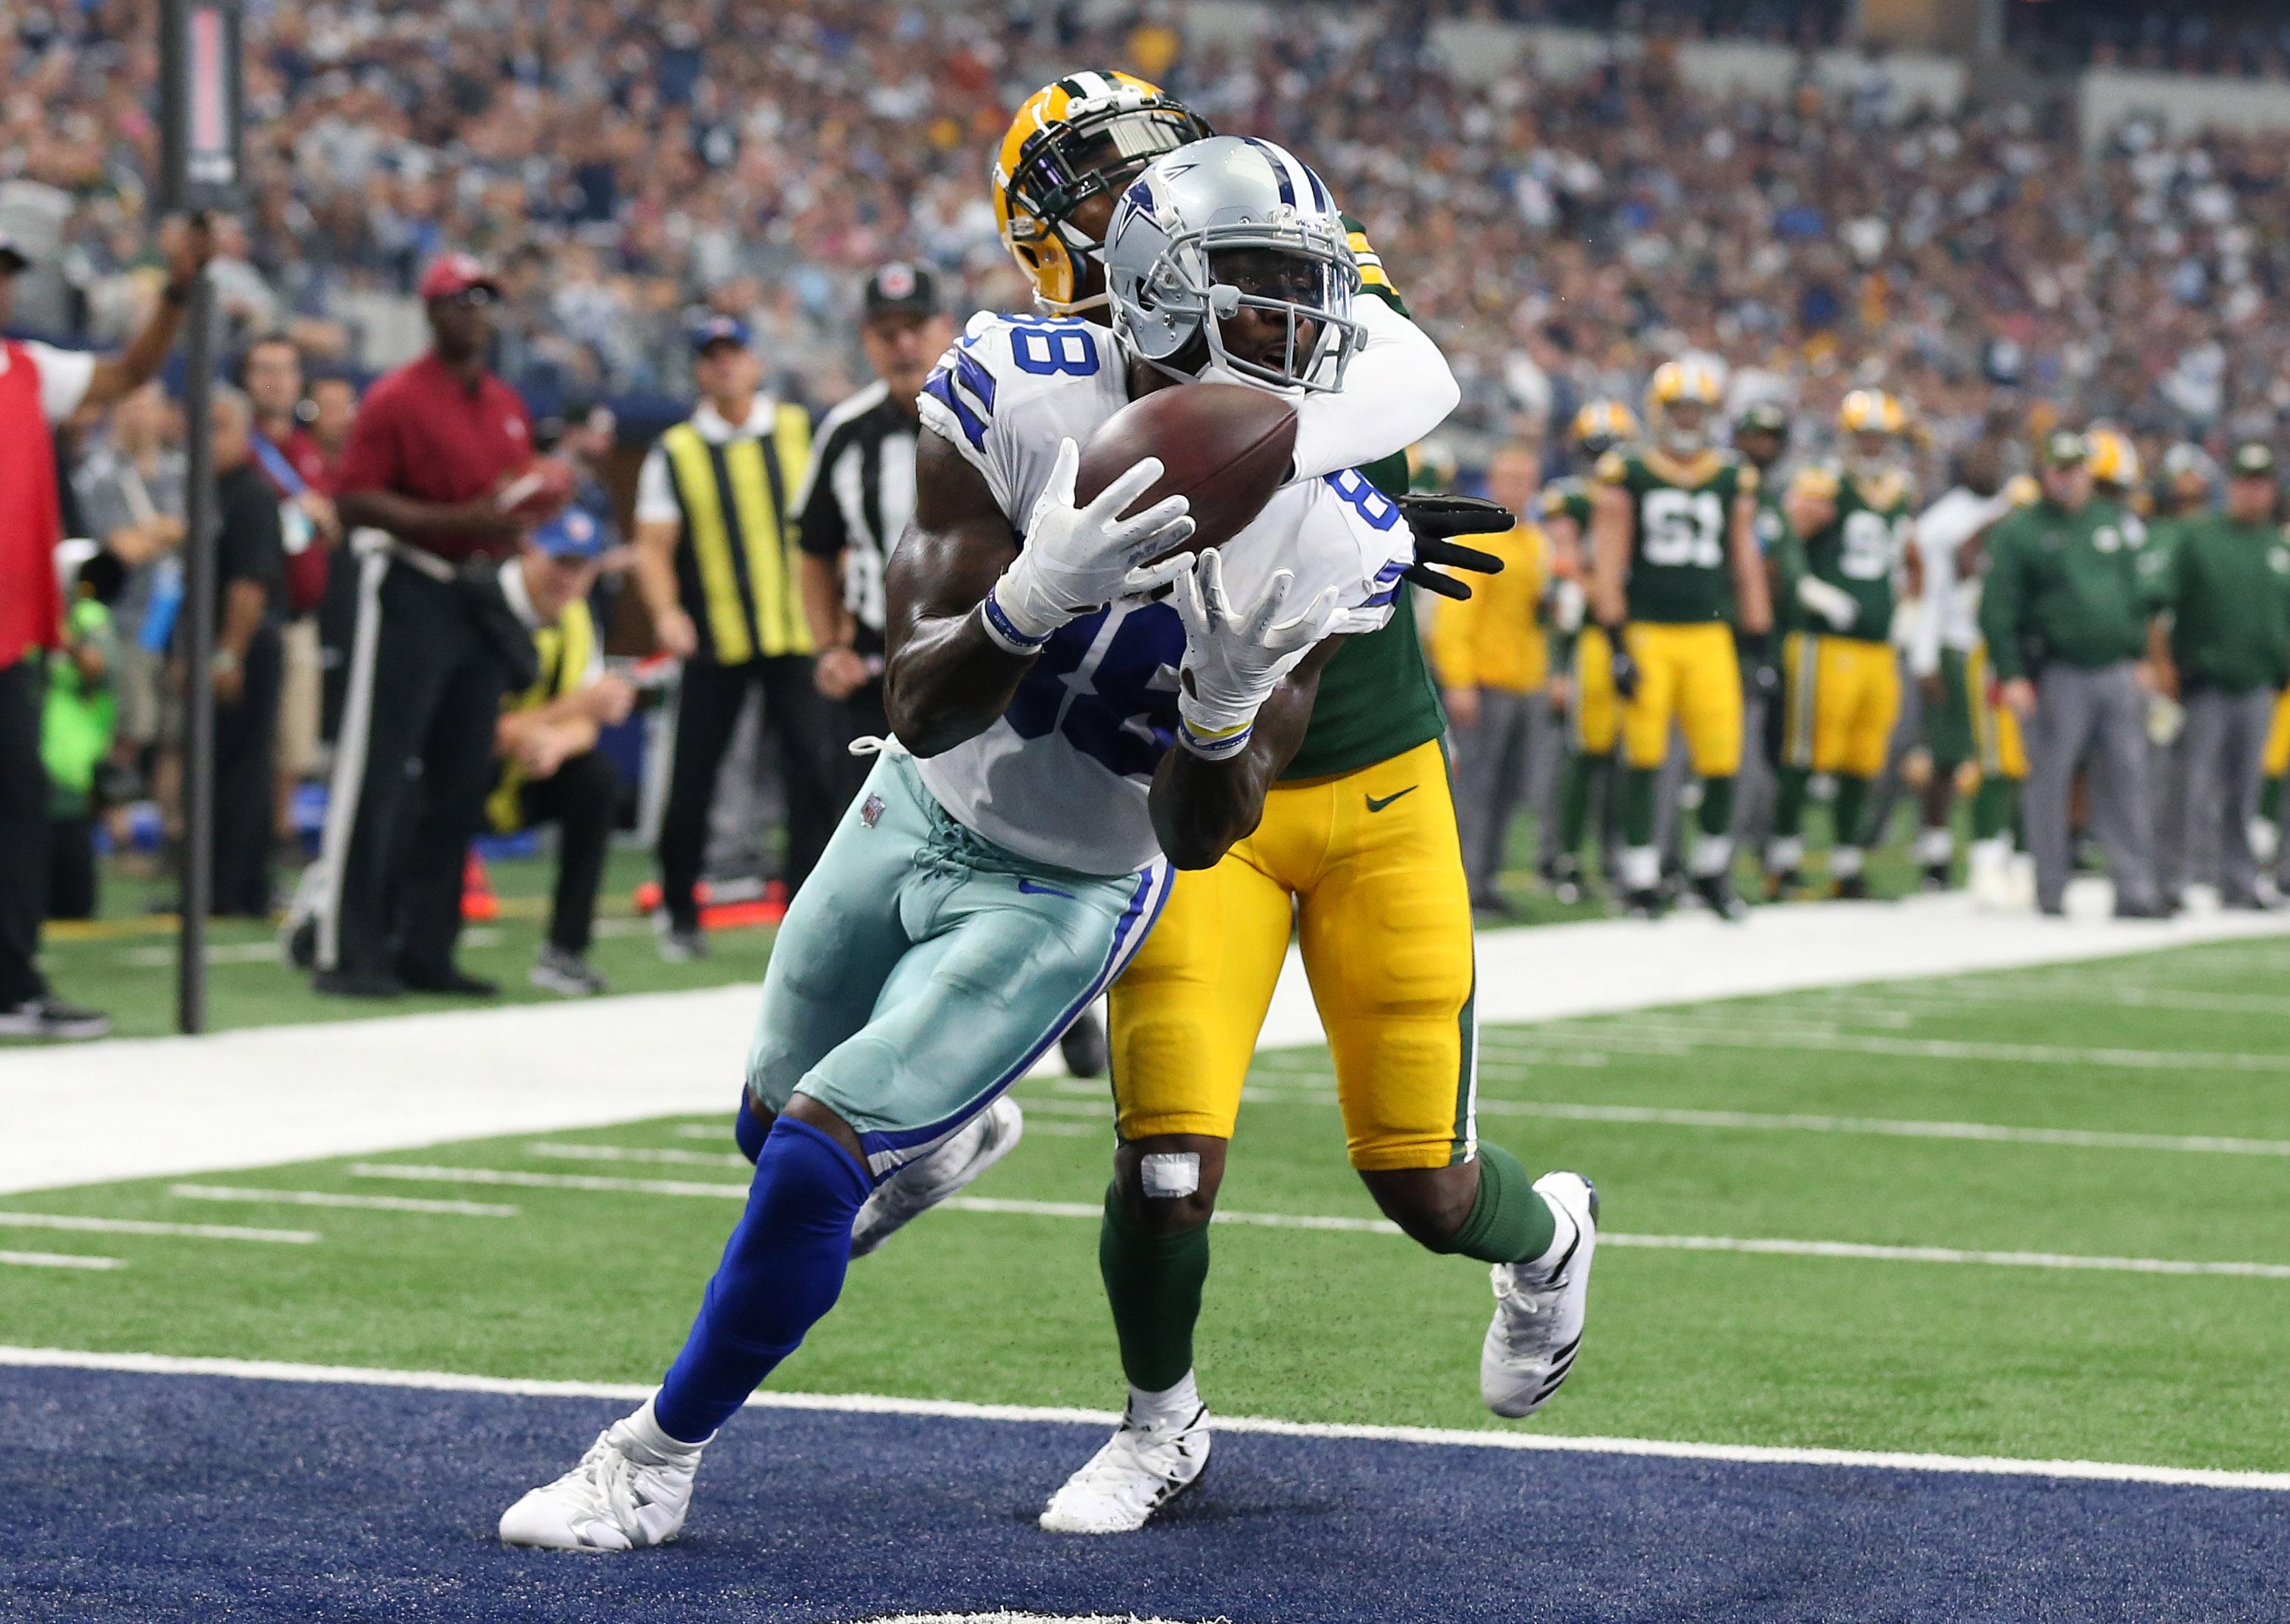 Oct 8, 2017; Arlington, TX, USA; Dallas Cowboys receiver Dez Bryant (88) makes a second quarter touchdown reception against Green Bay Packers cornerback Damarious Randall (23) at AT&T Stadium. Mandatory Credit: Matthew Emmons-USA TODAY Sports